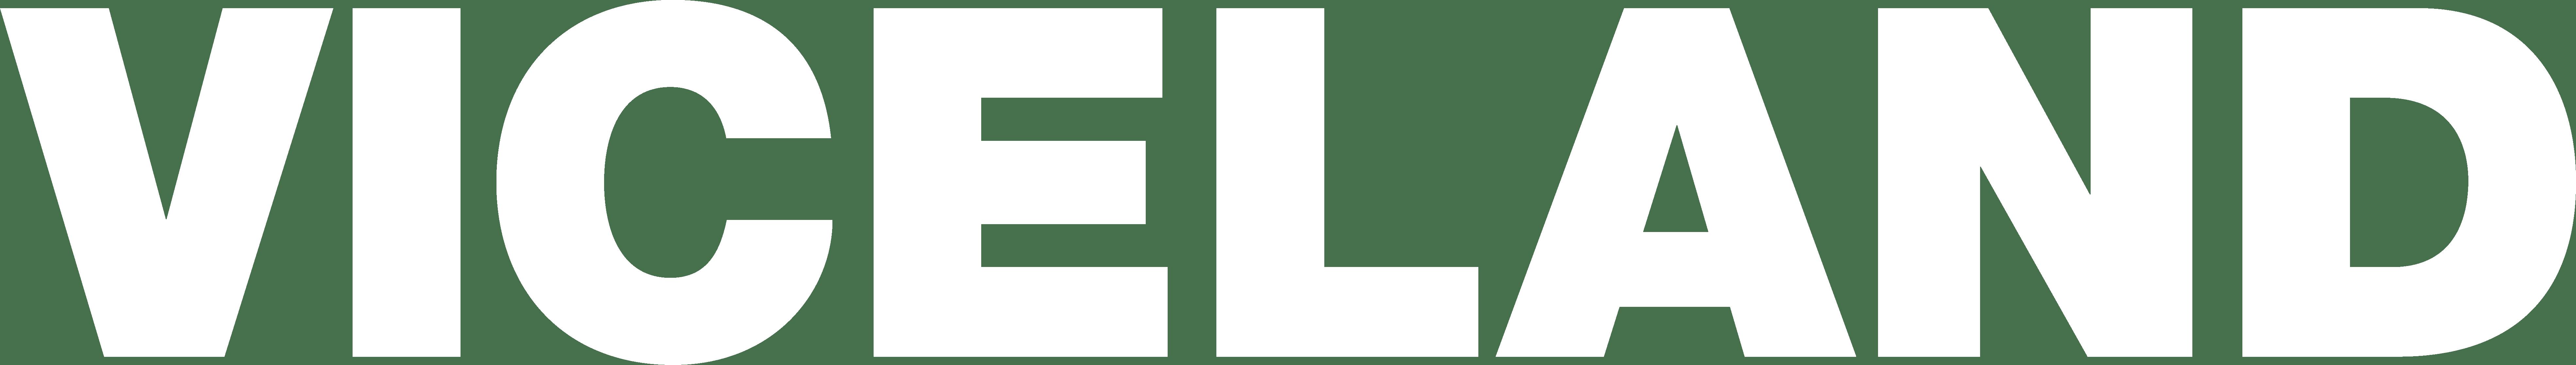 Viceland Logos.